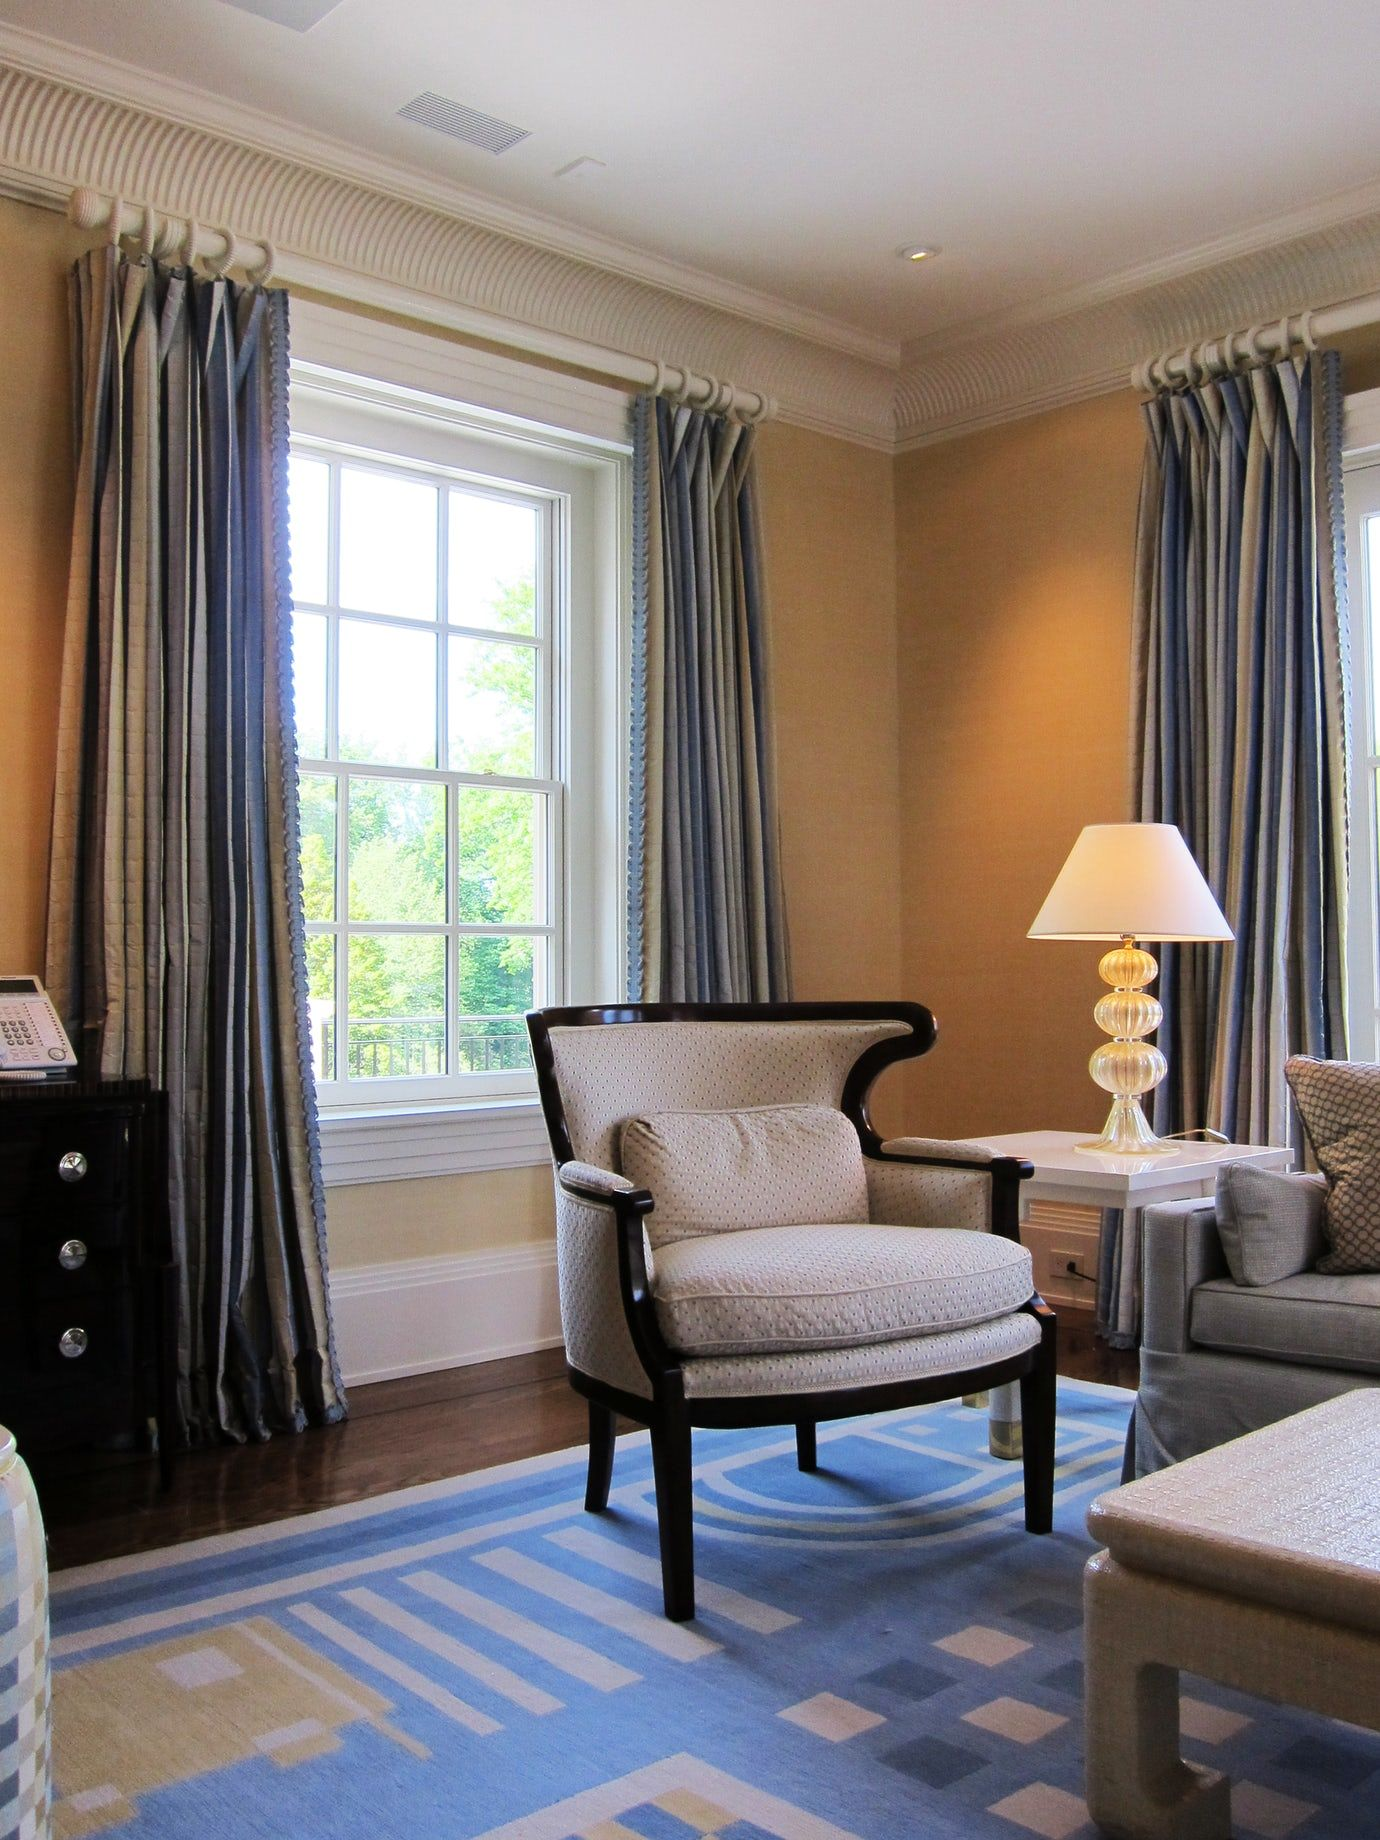 A quaint sitting room in this Pennsylvania home gets custom drapes ...